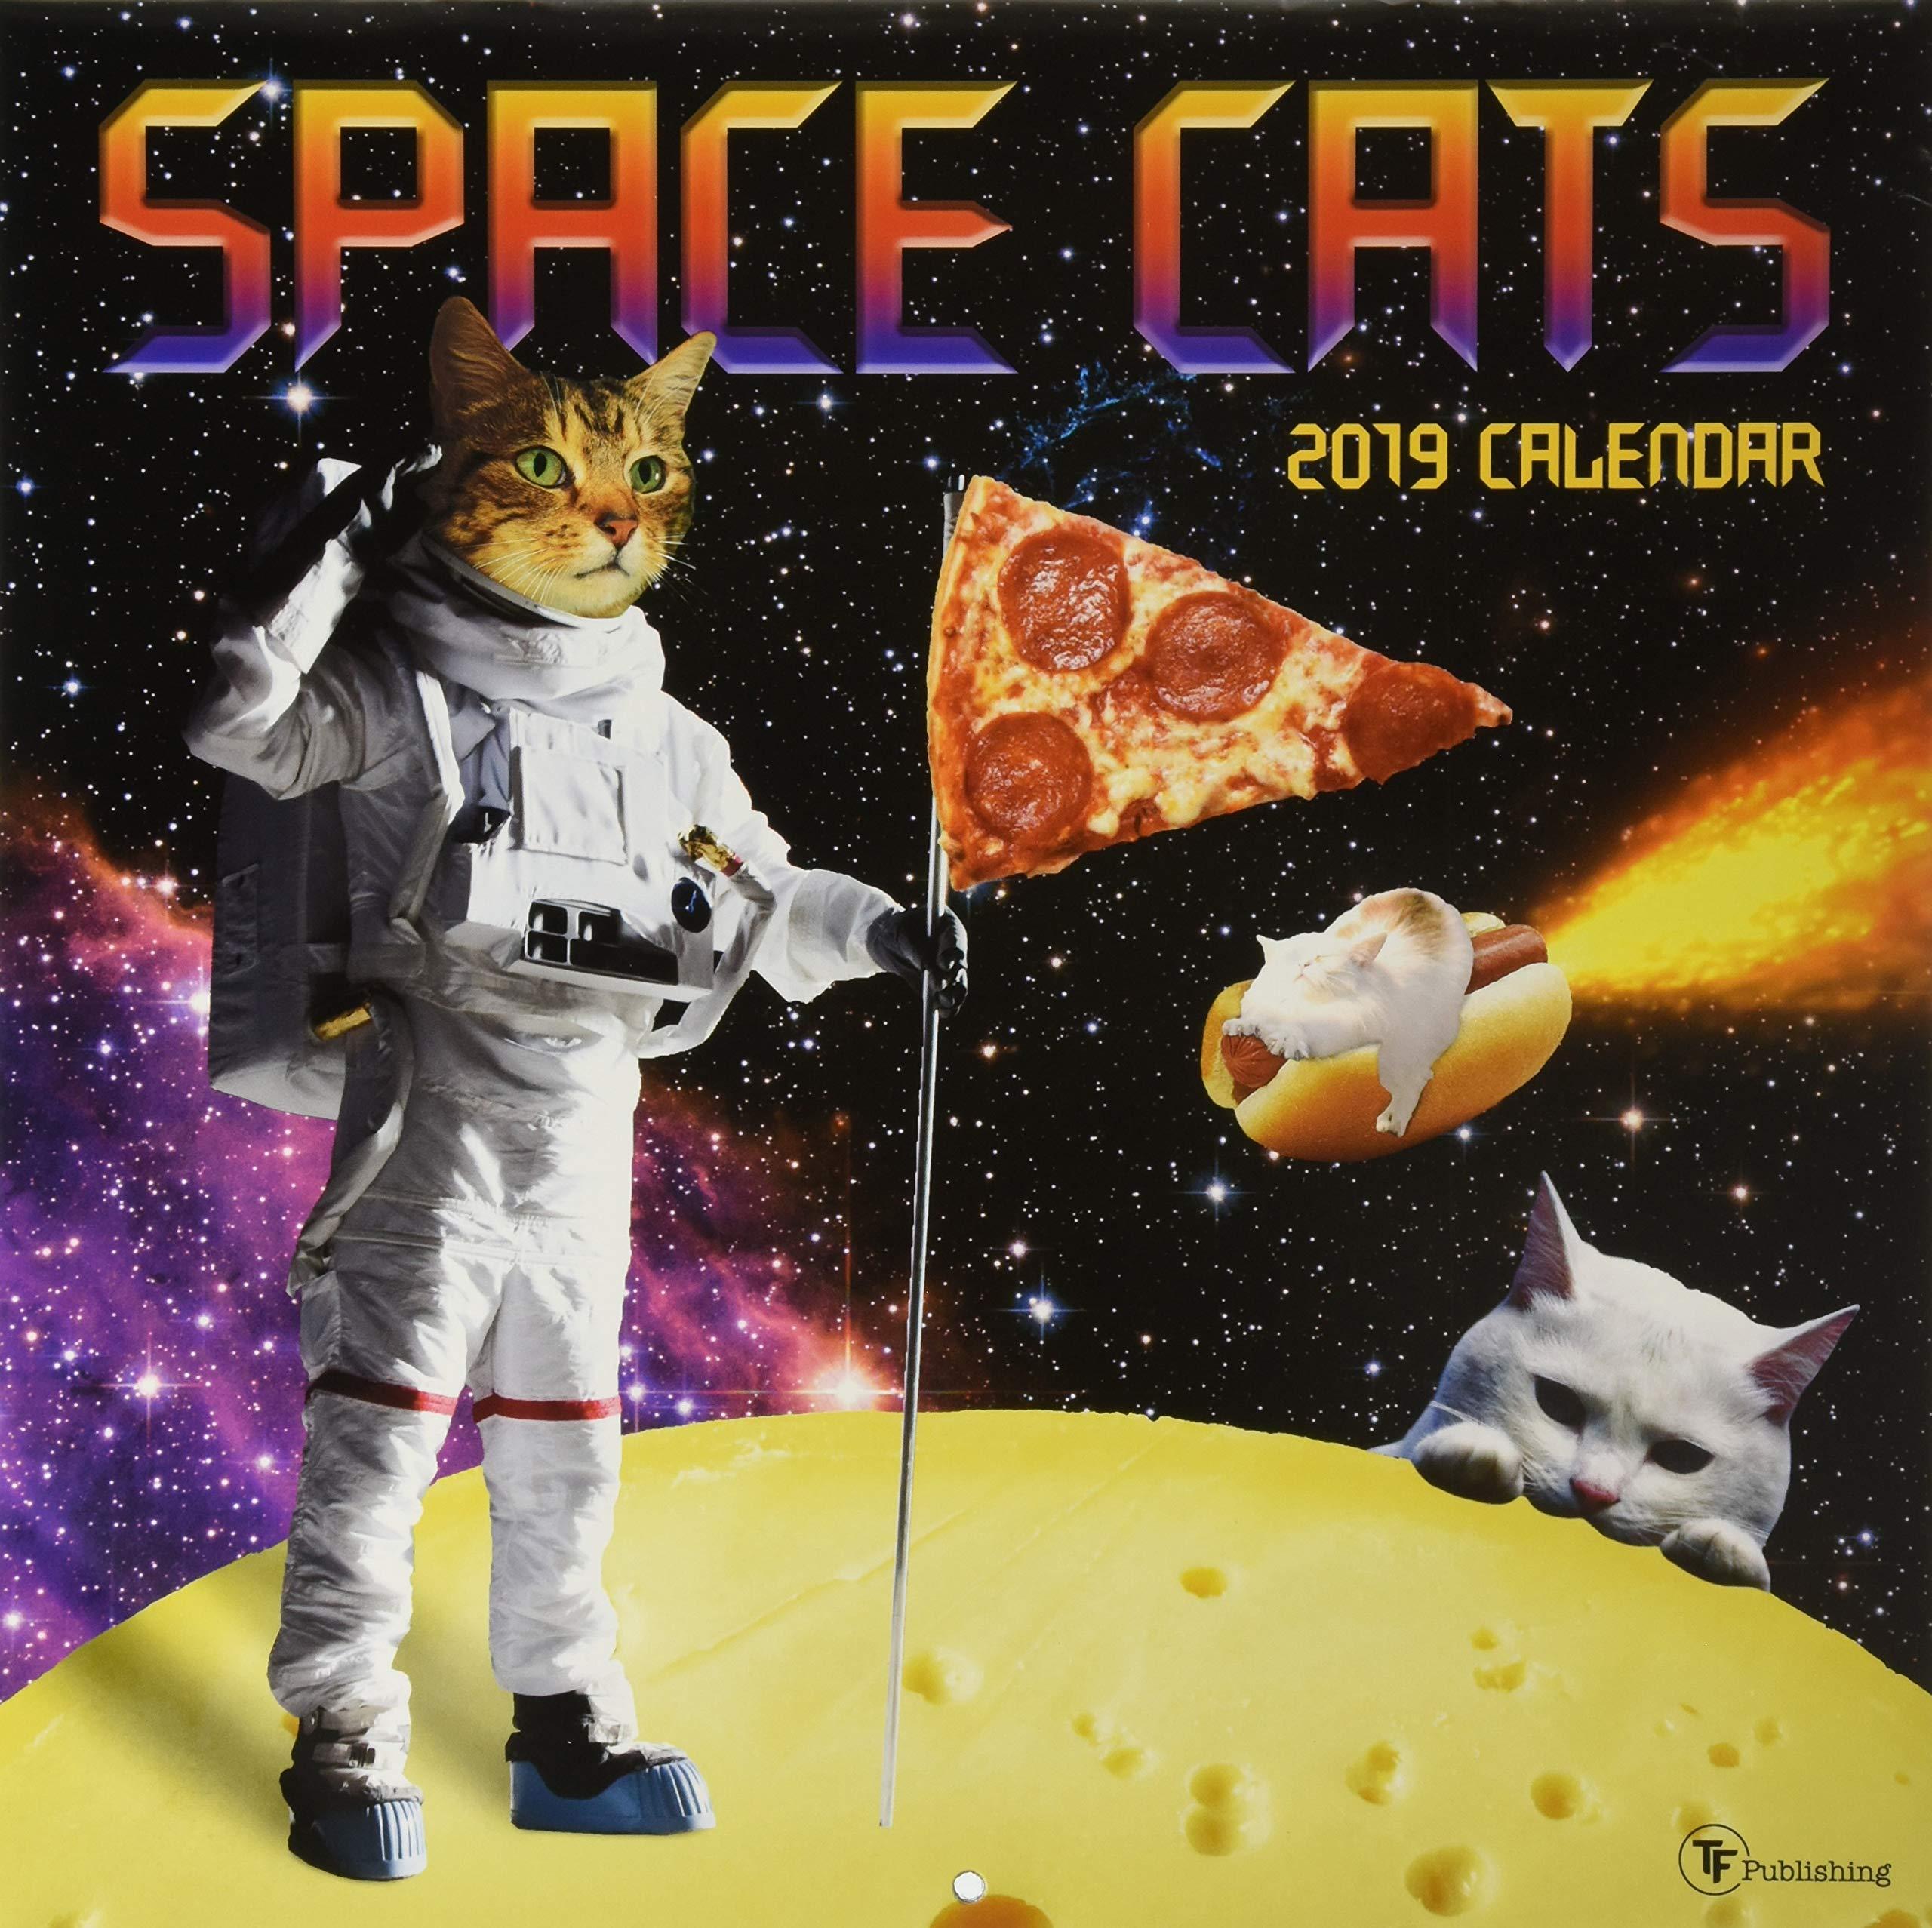 2019 Space Cats Wall Calendar TF Publishing 0619344335657